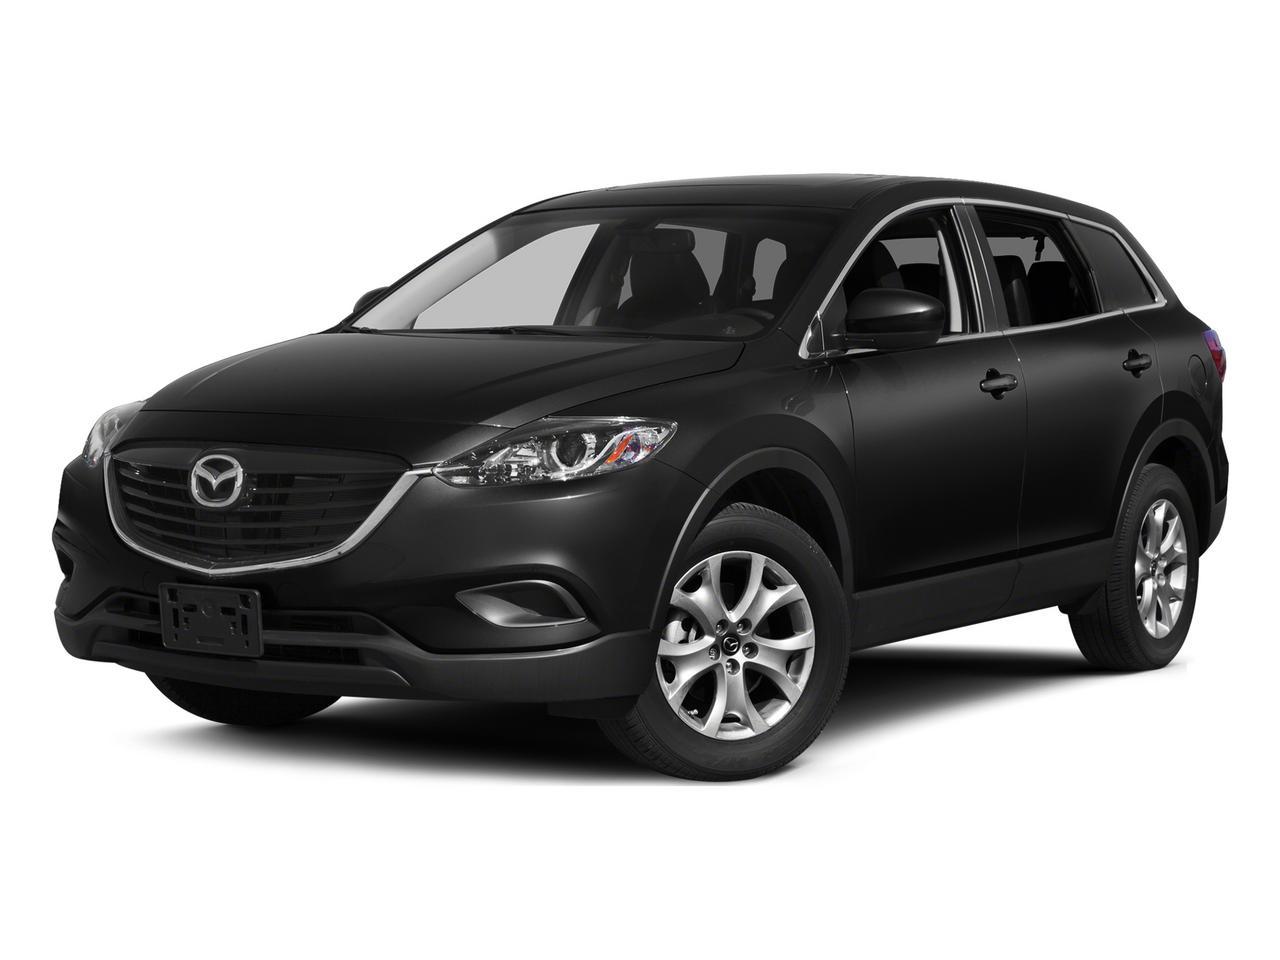 2015 Mazda CX-9 Vehicle Photo in Cary, NC 27511